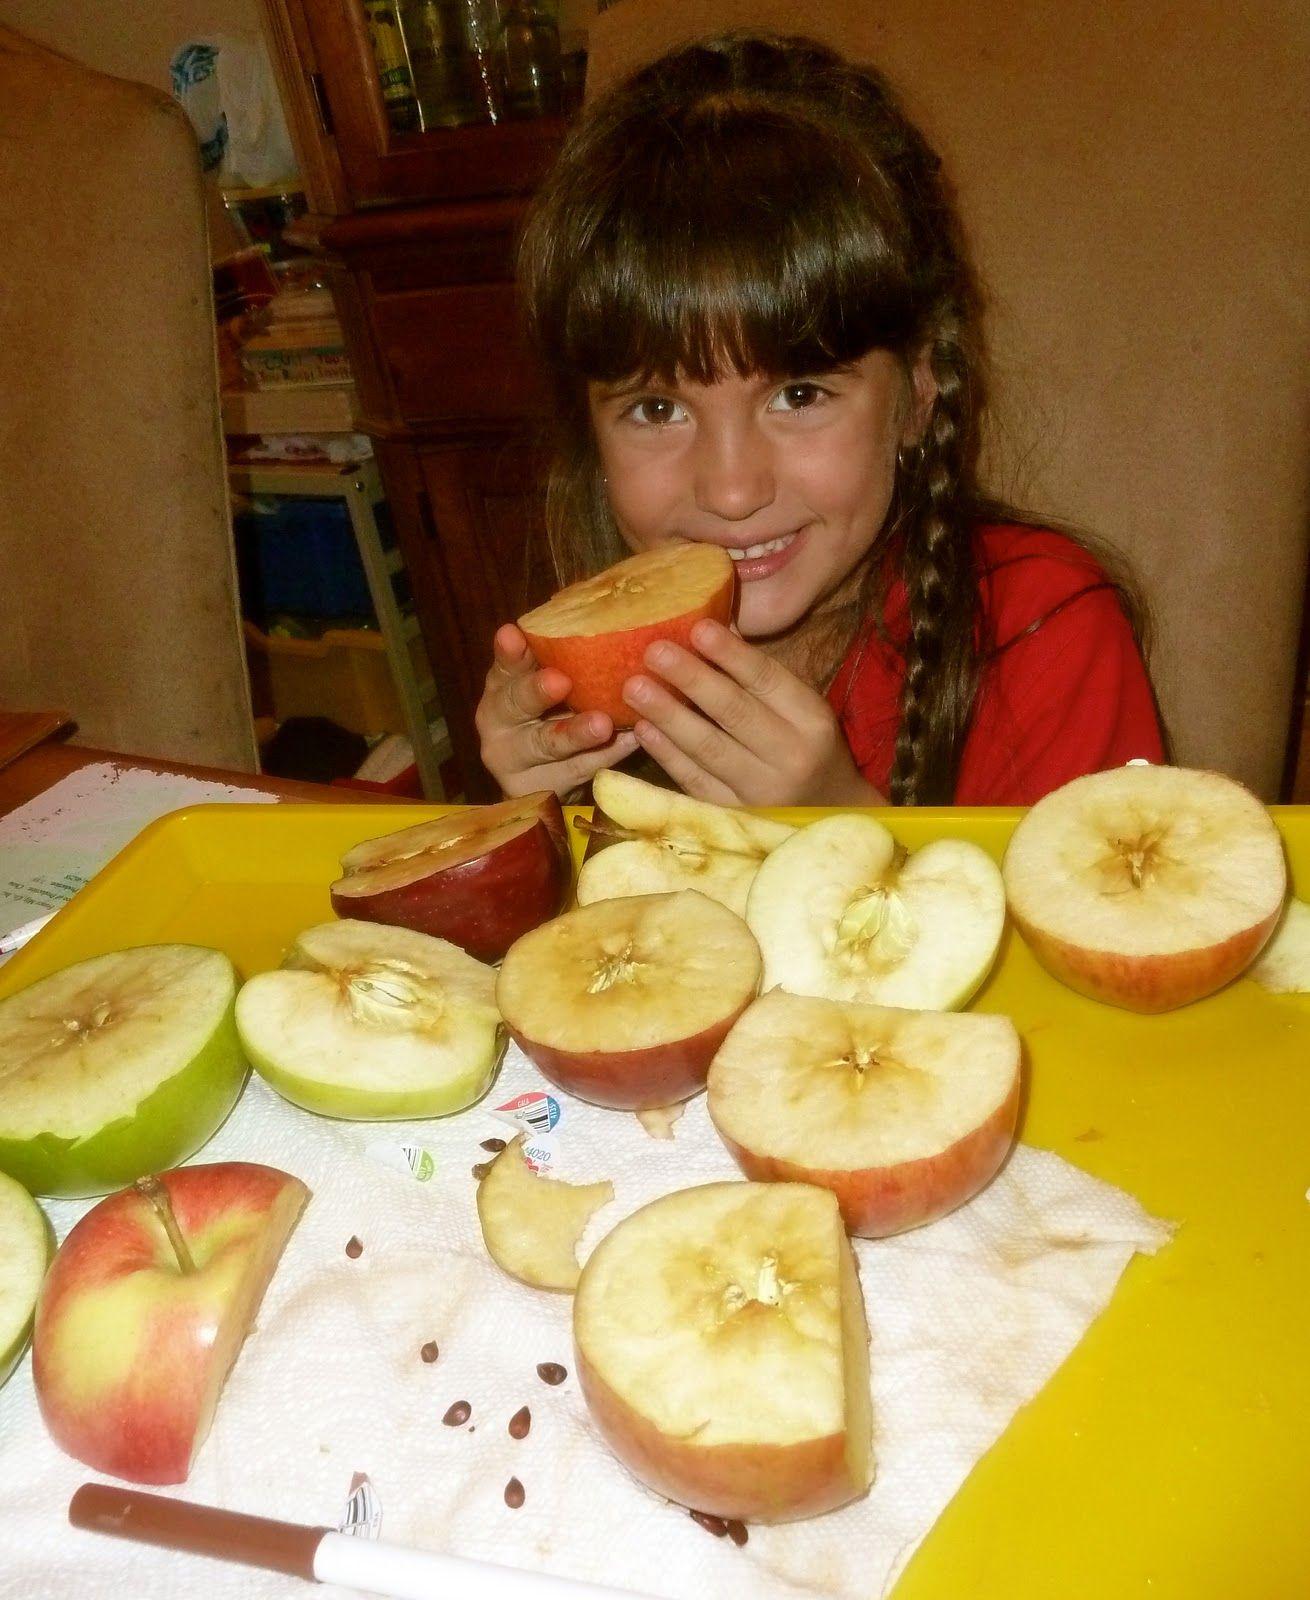 Exploring Tasting Amp Stamping Apples